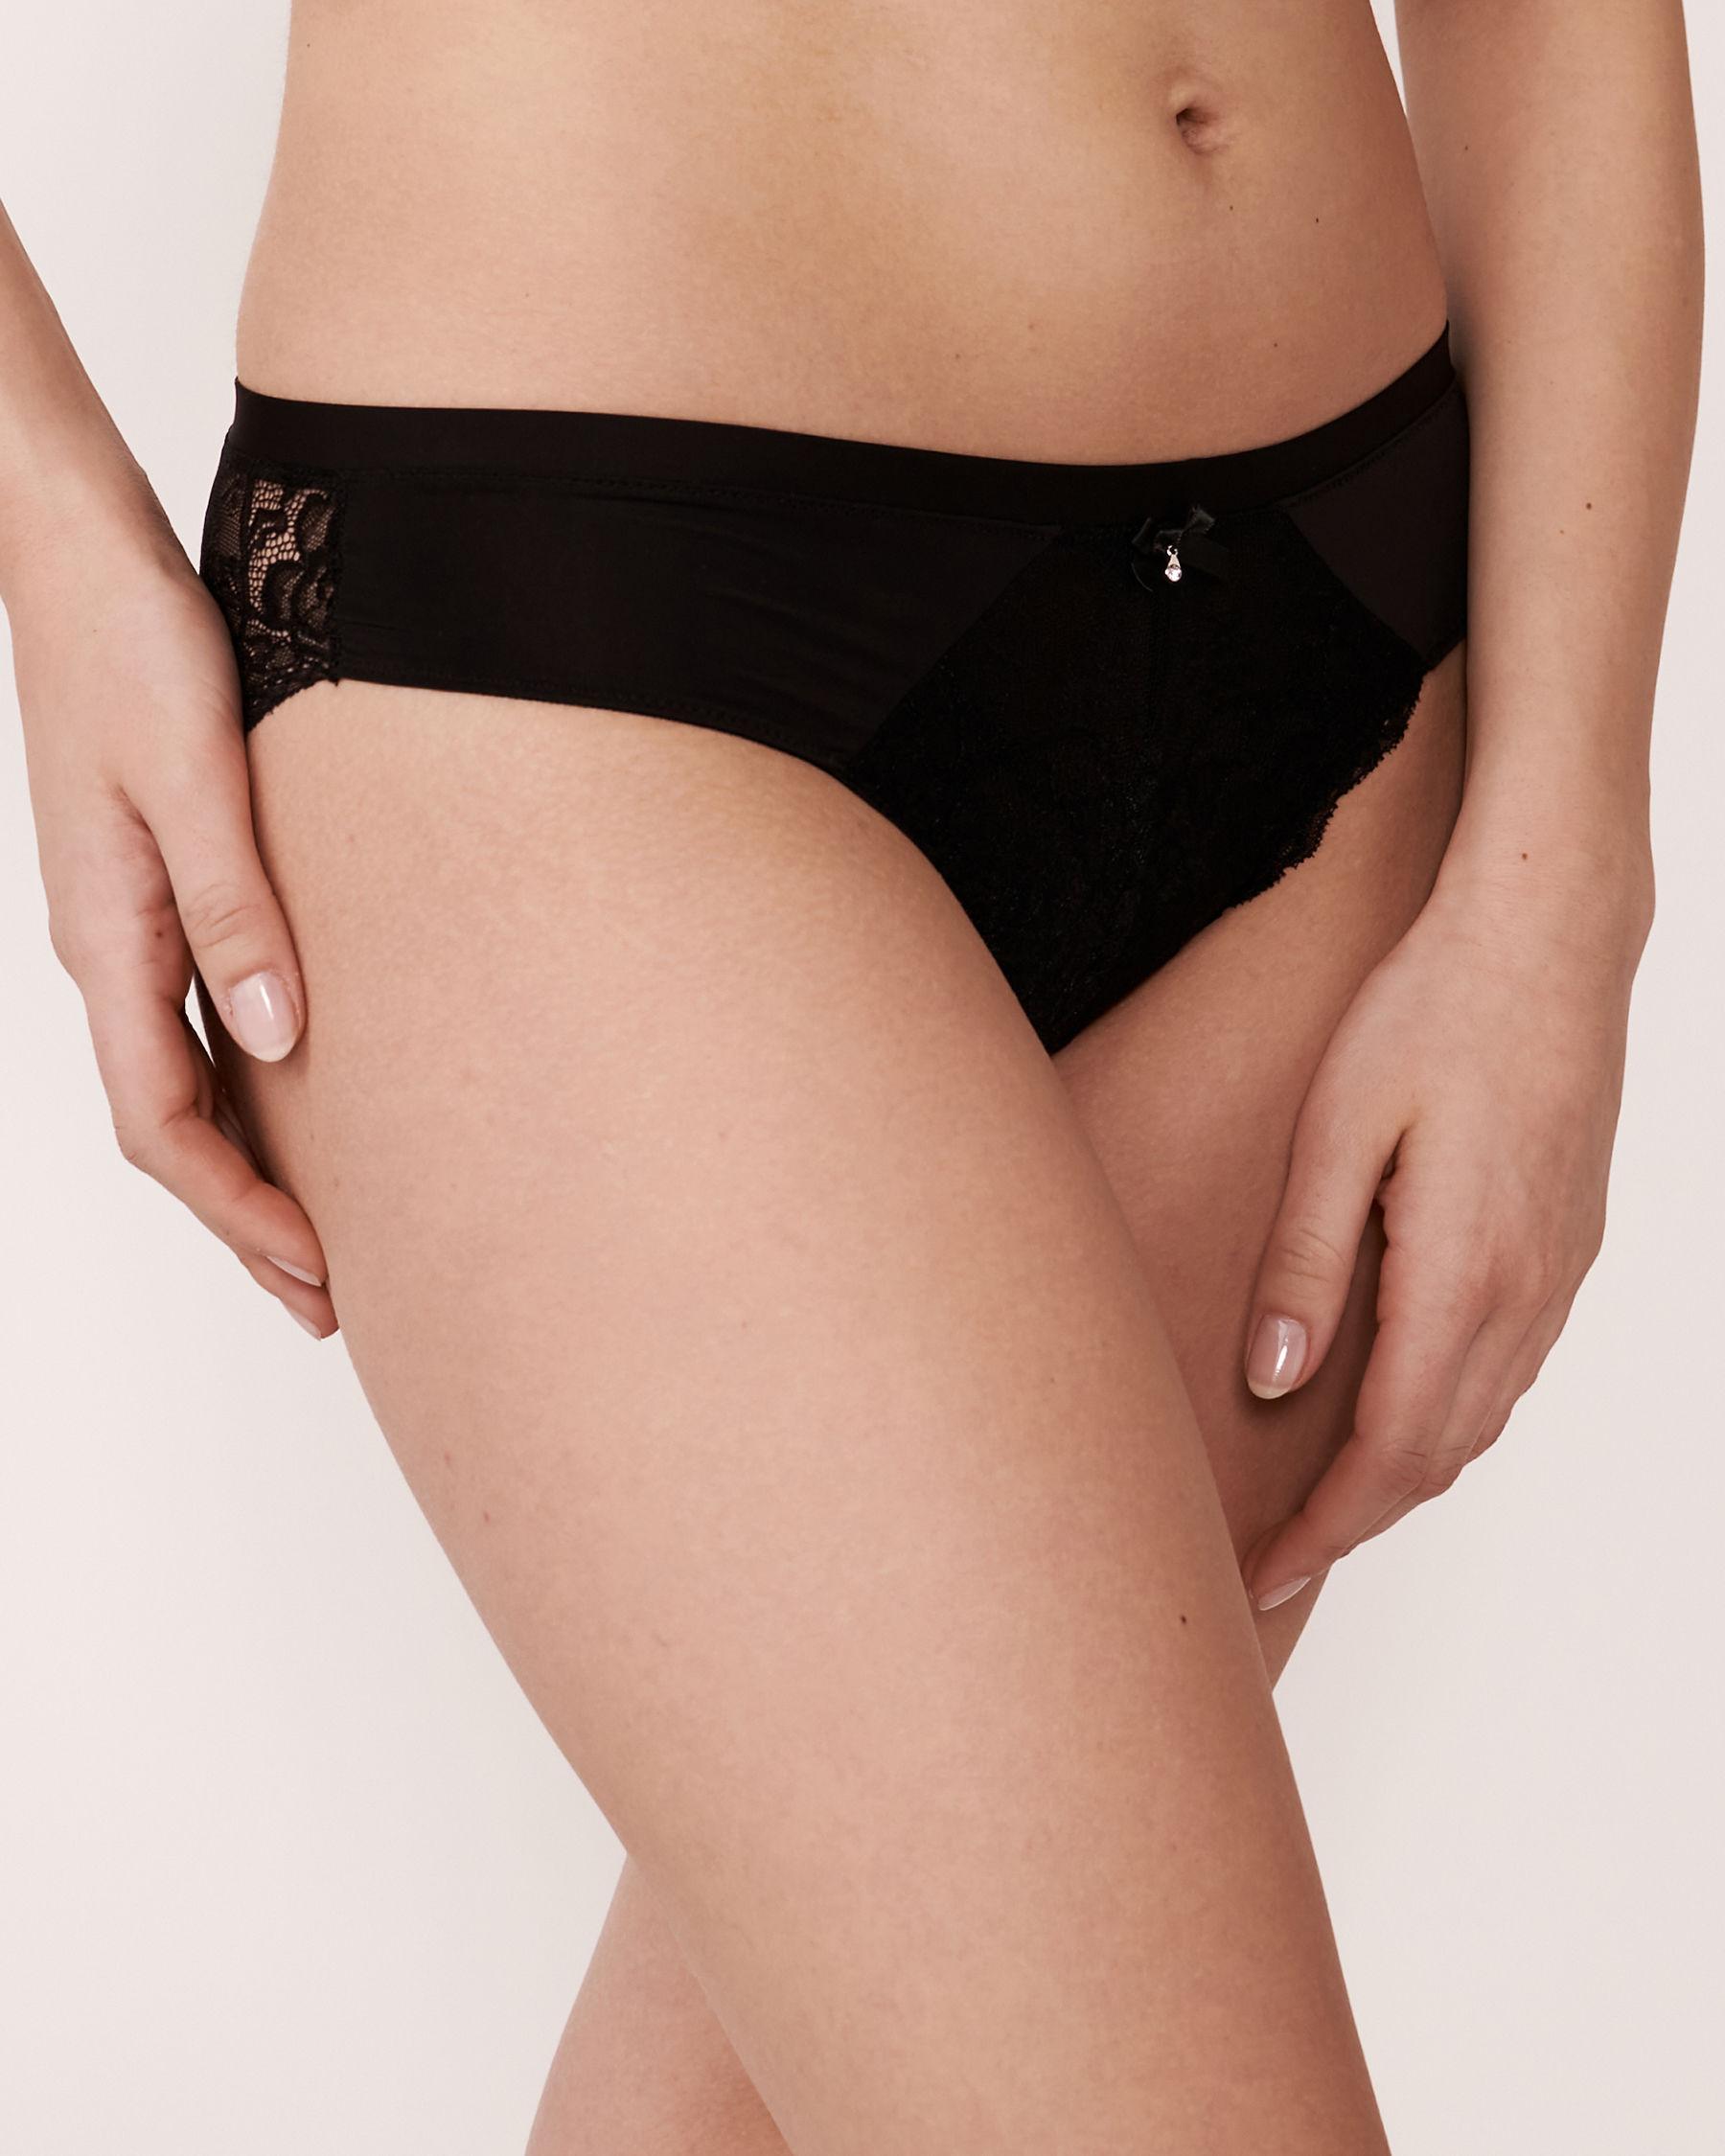 LA VIE EN ROSE Culotte bikini Noir 618-122-3-00 - Voir1